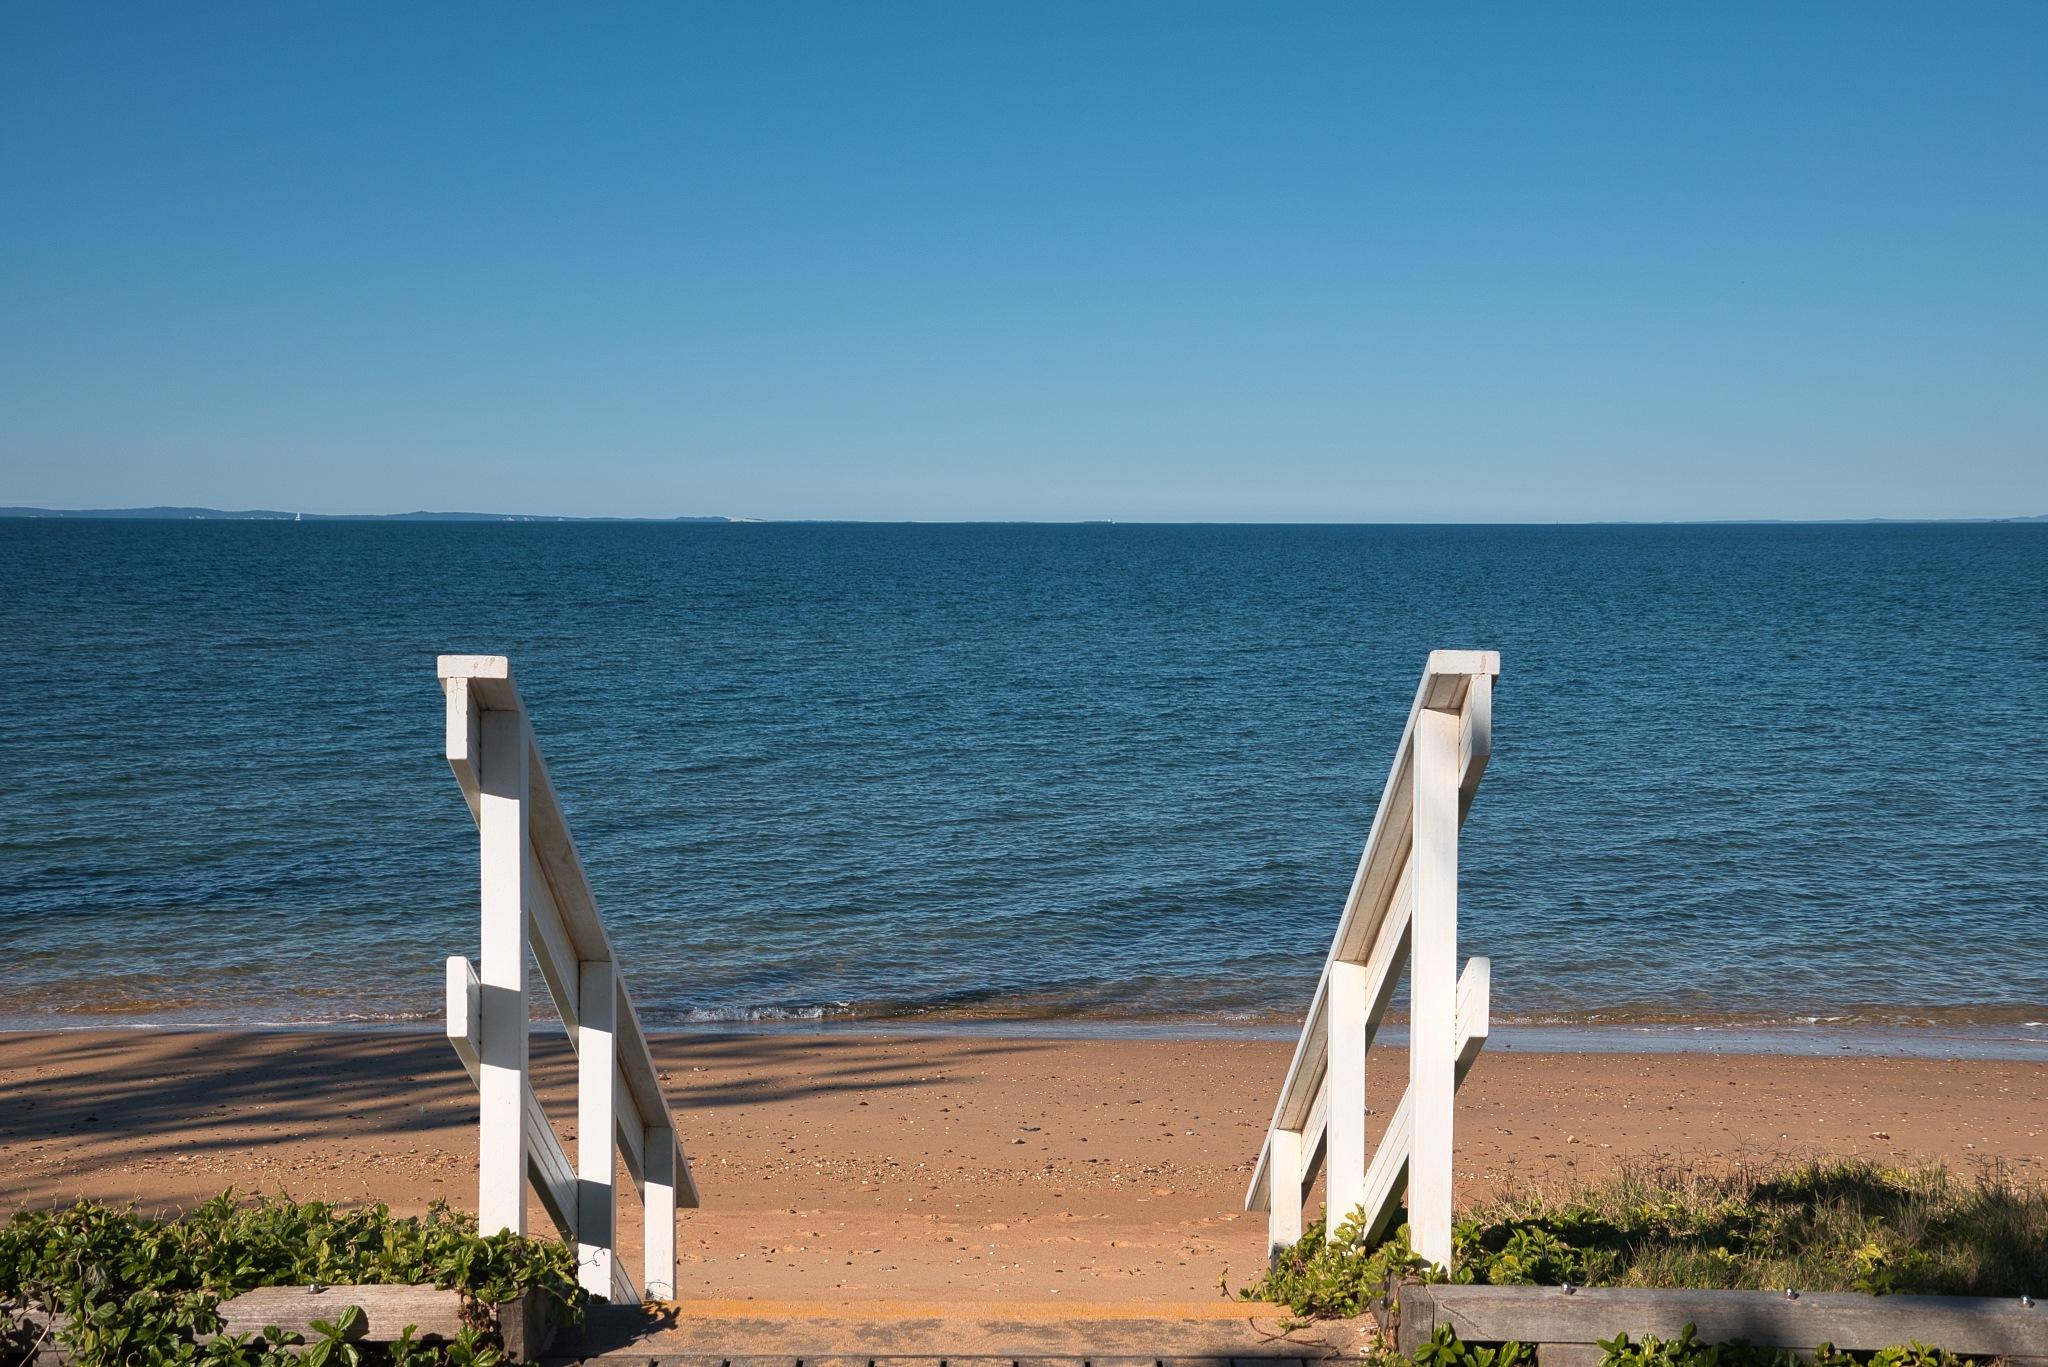 Down to the Sea by Kim McGlinchey